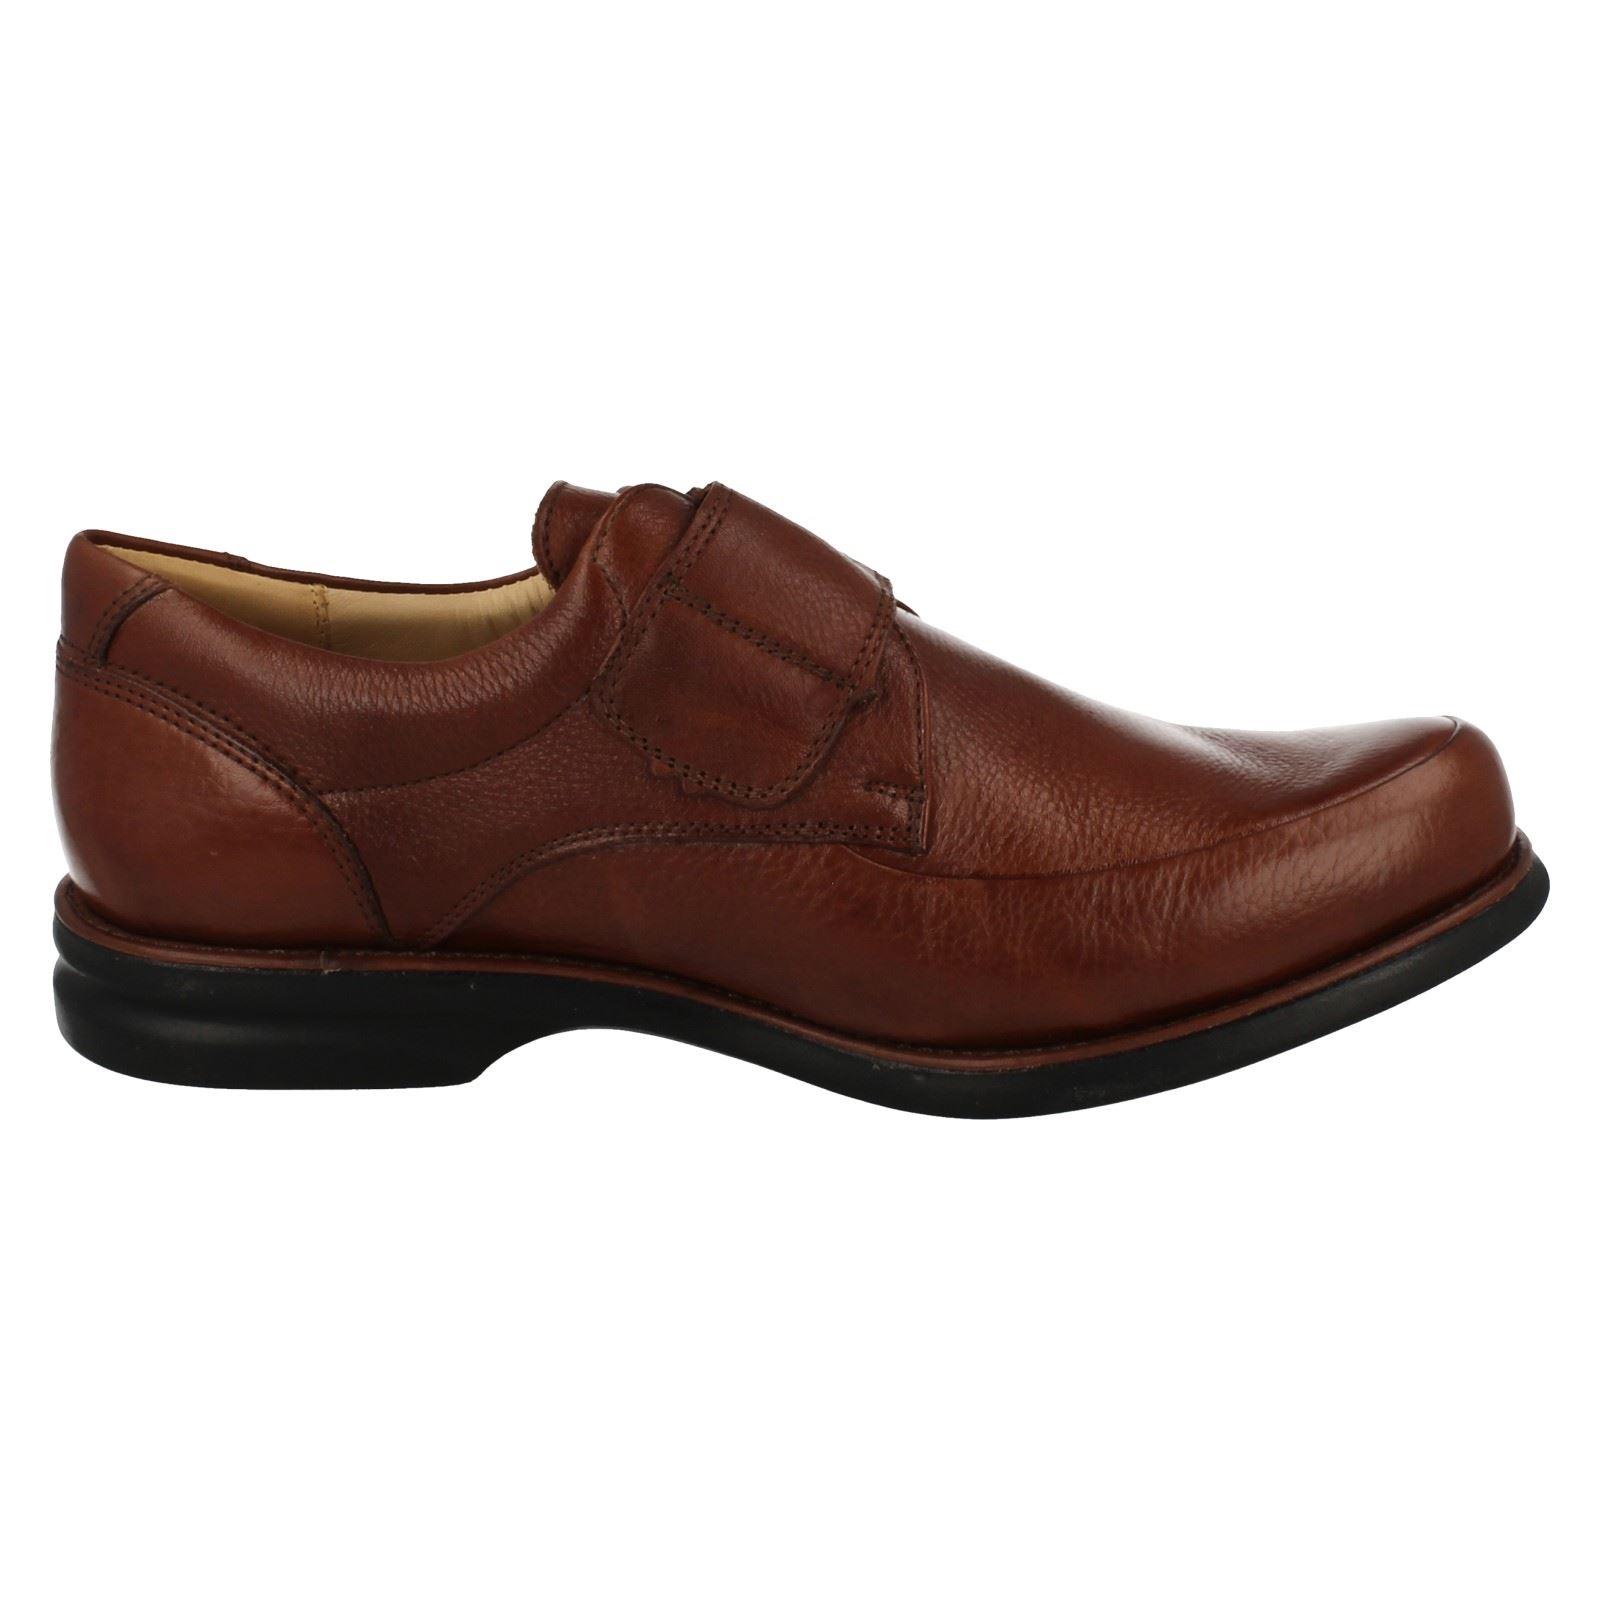 mens anatomic smart casual velcro shoes tapajos ebay